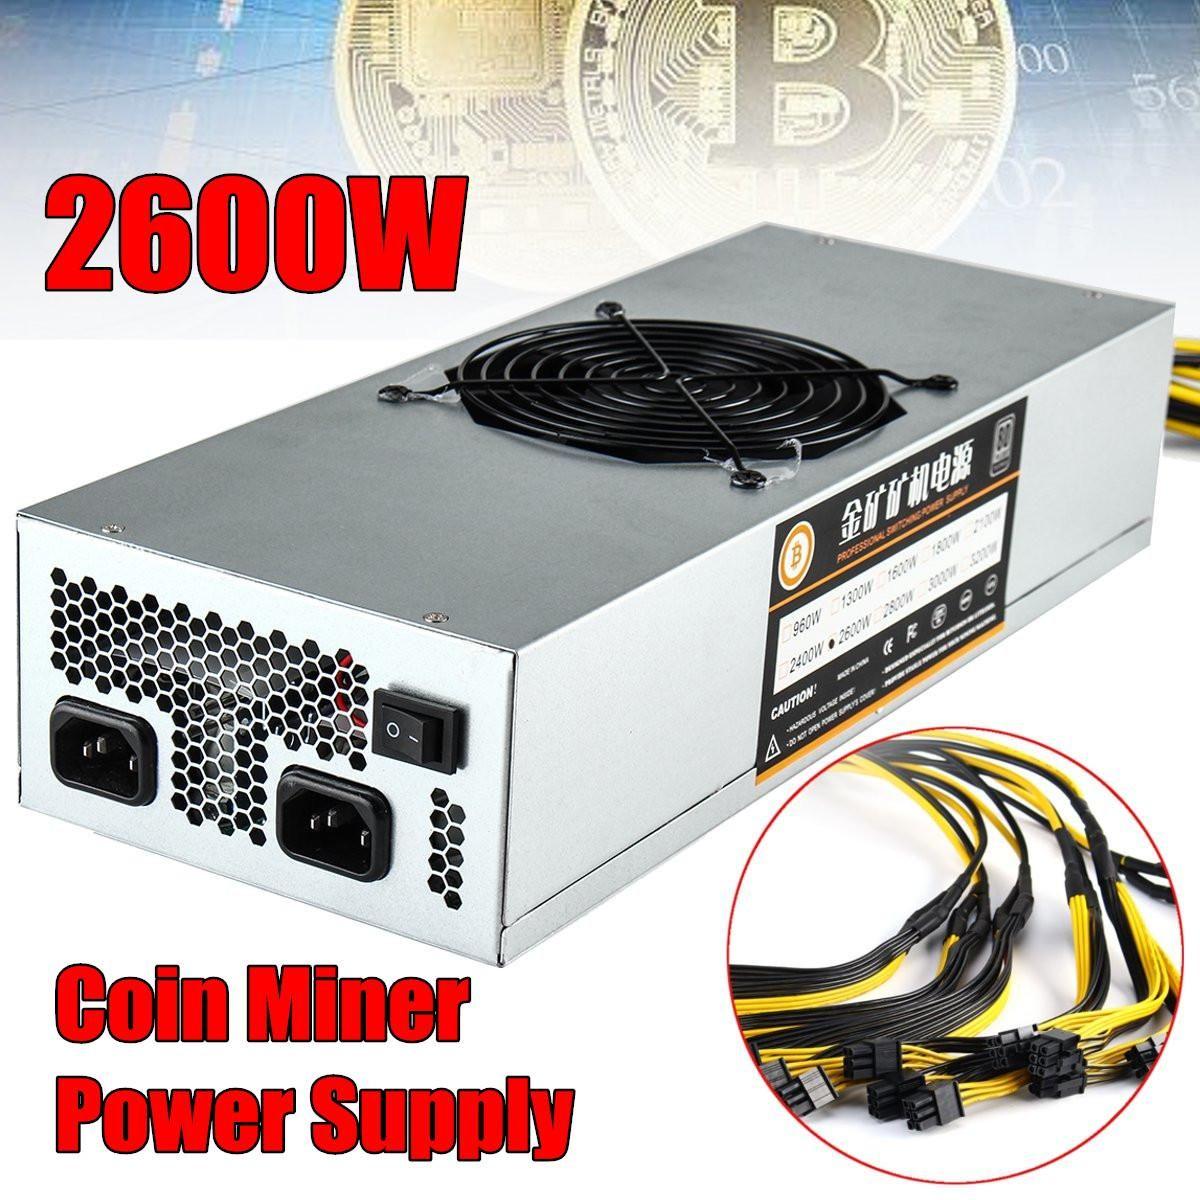 2600w power supply D3 R4 APW3 M1 M3 18*6p,ETH PSU,antminer A4 A6 S7 S9 E9 L-3 BTC LTC DASH miner power supply